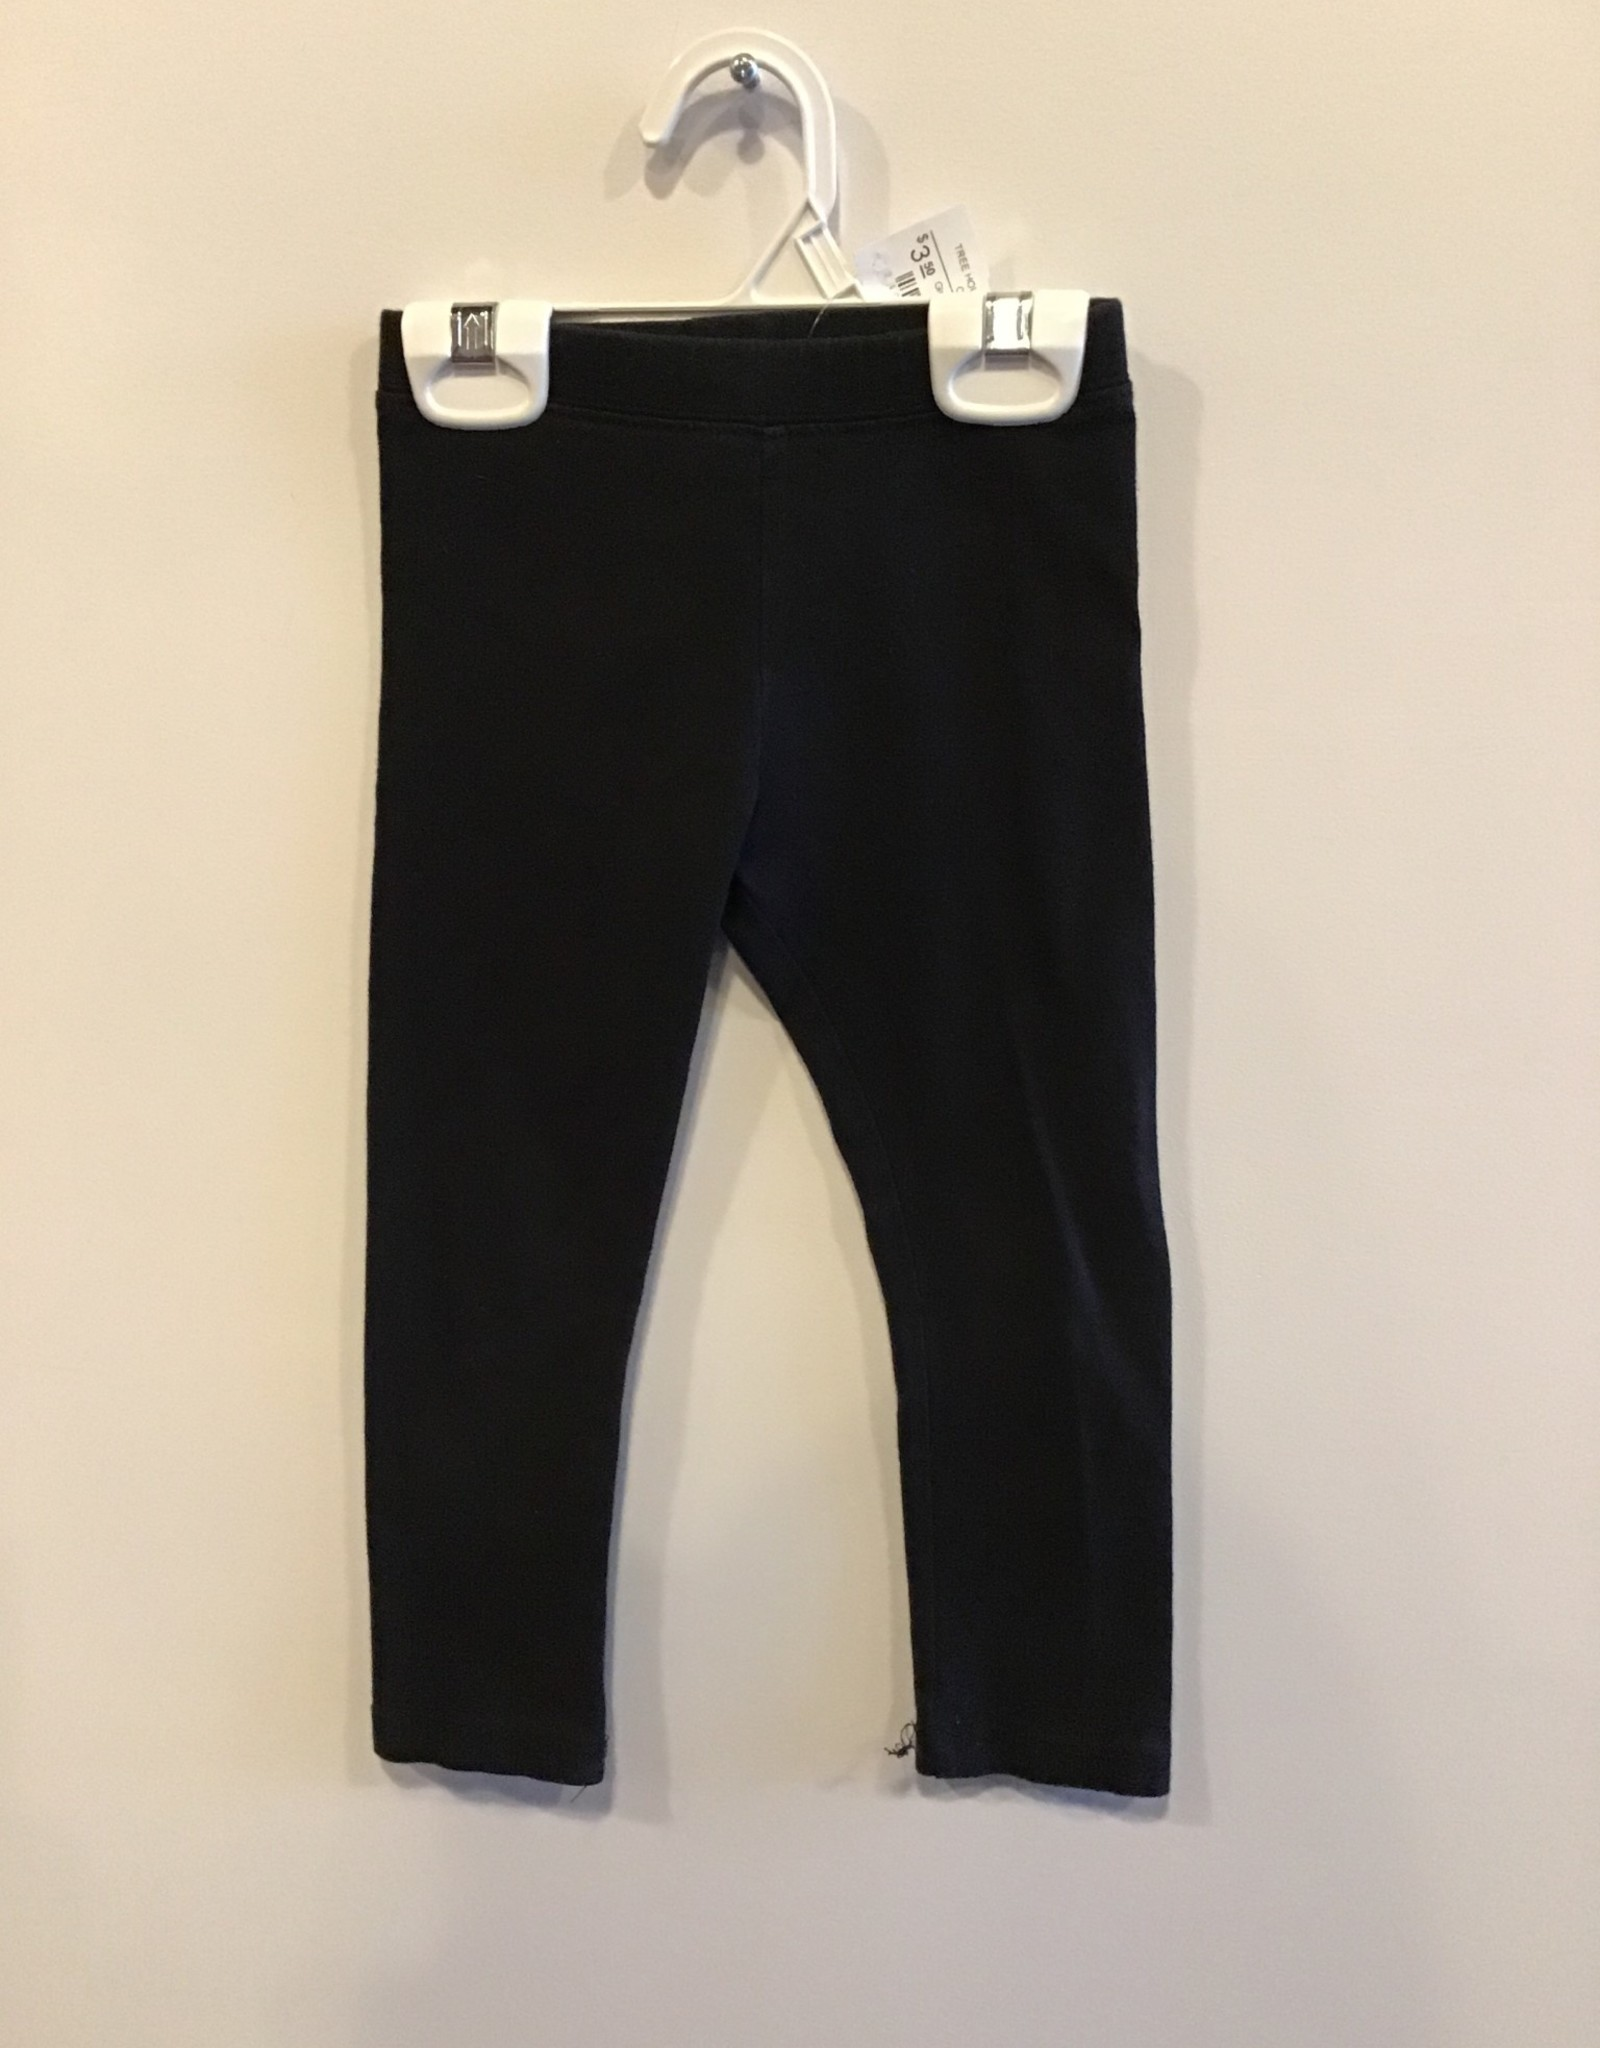 Old Navy Girls/3T/OldNavy/Pants